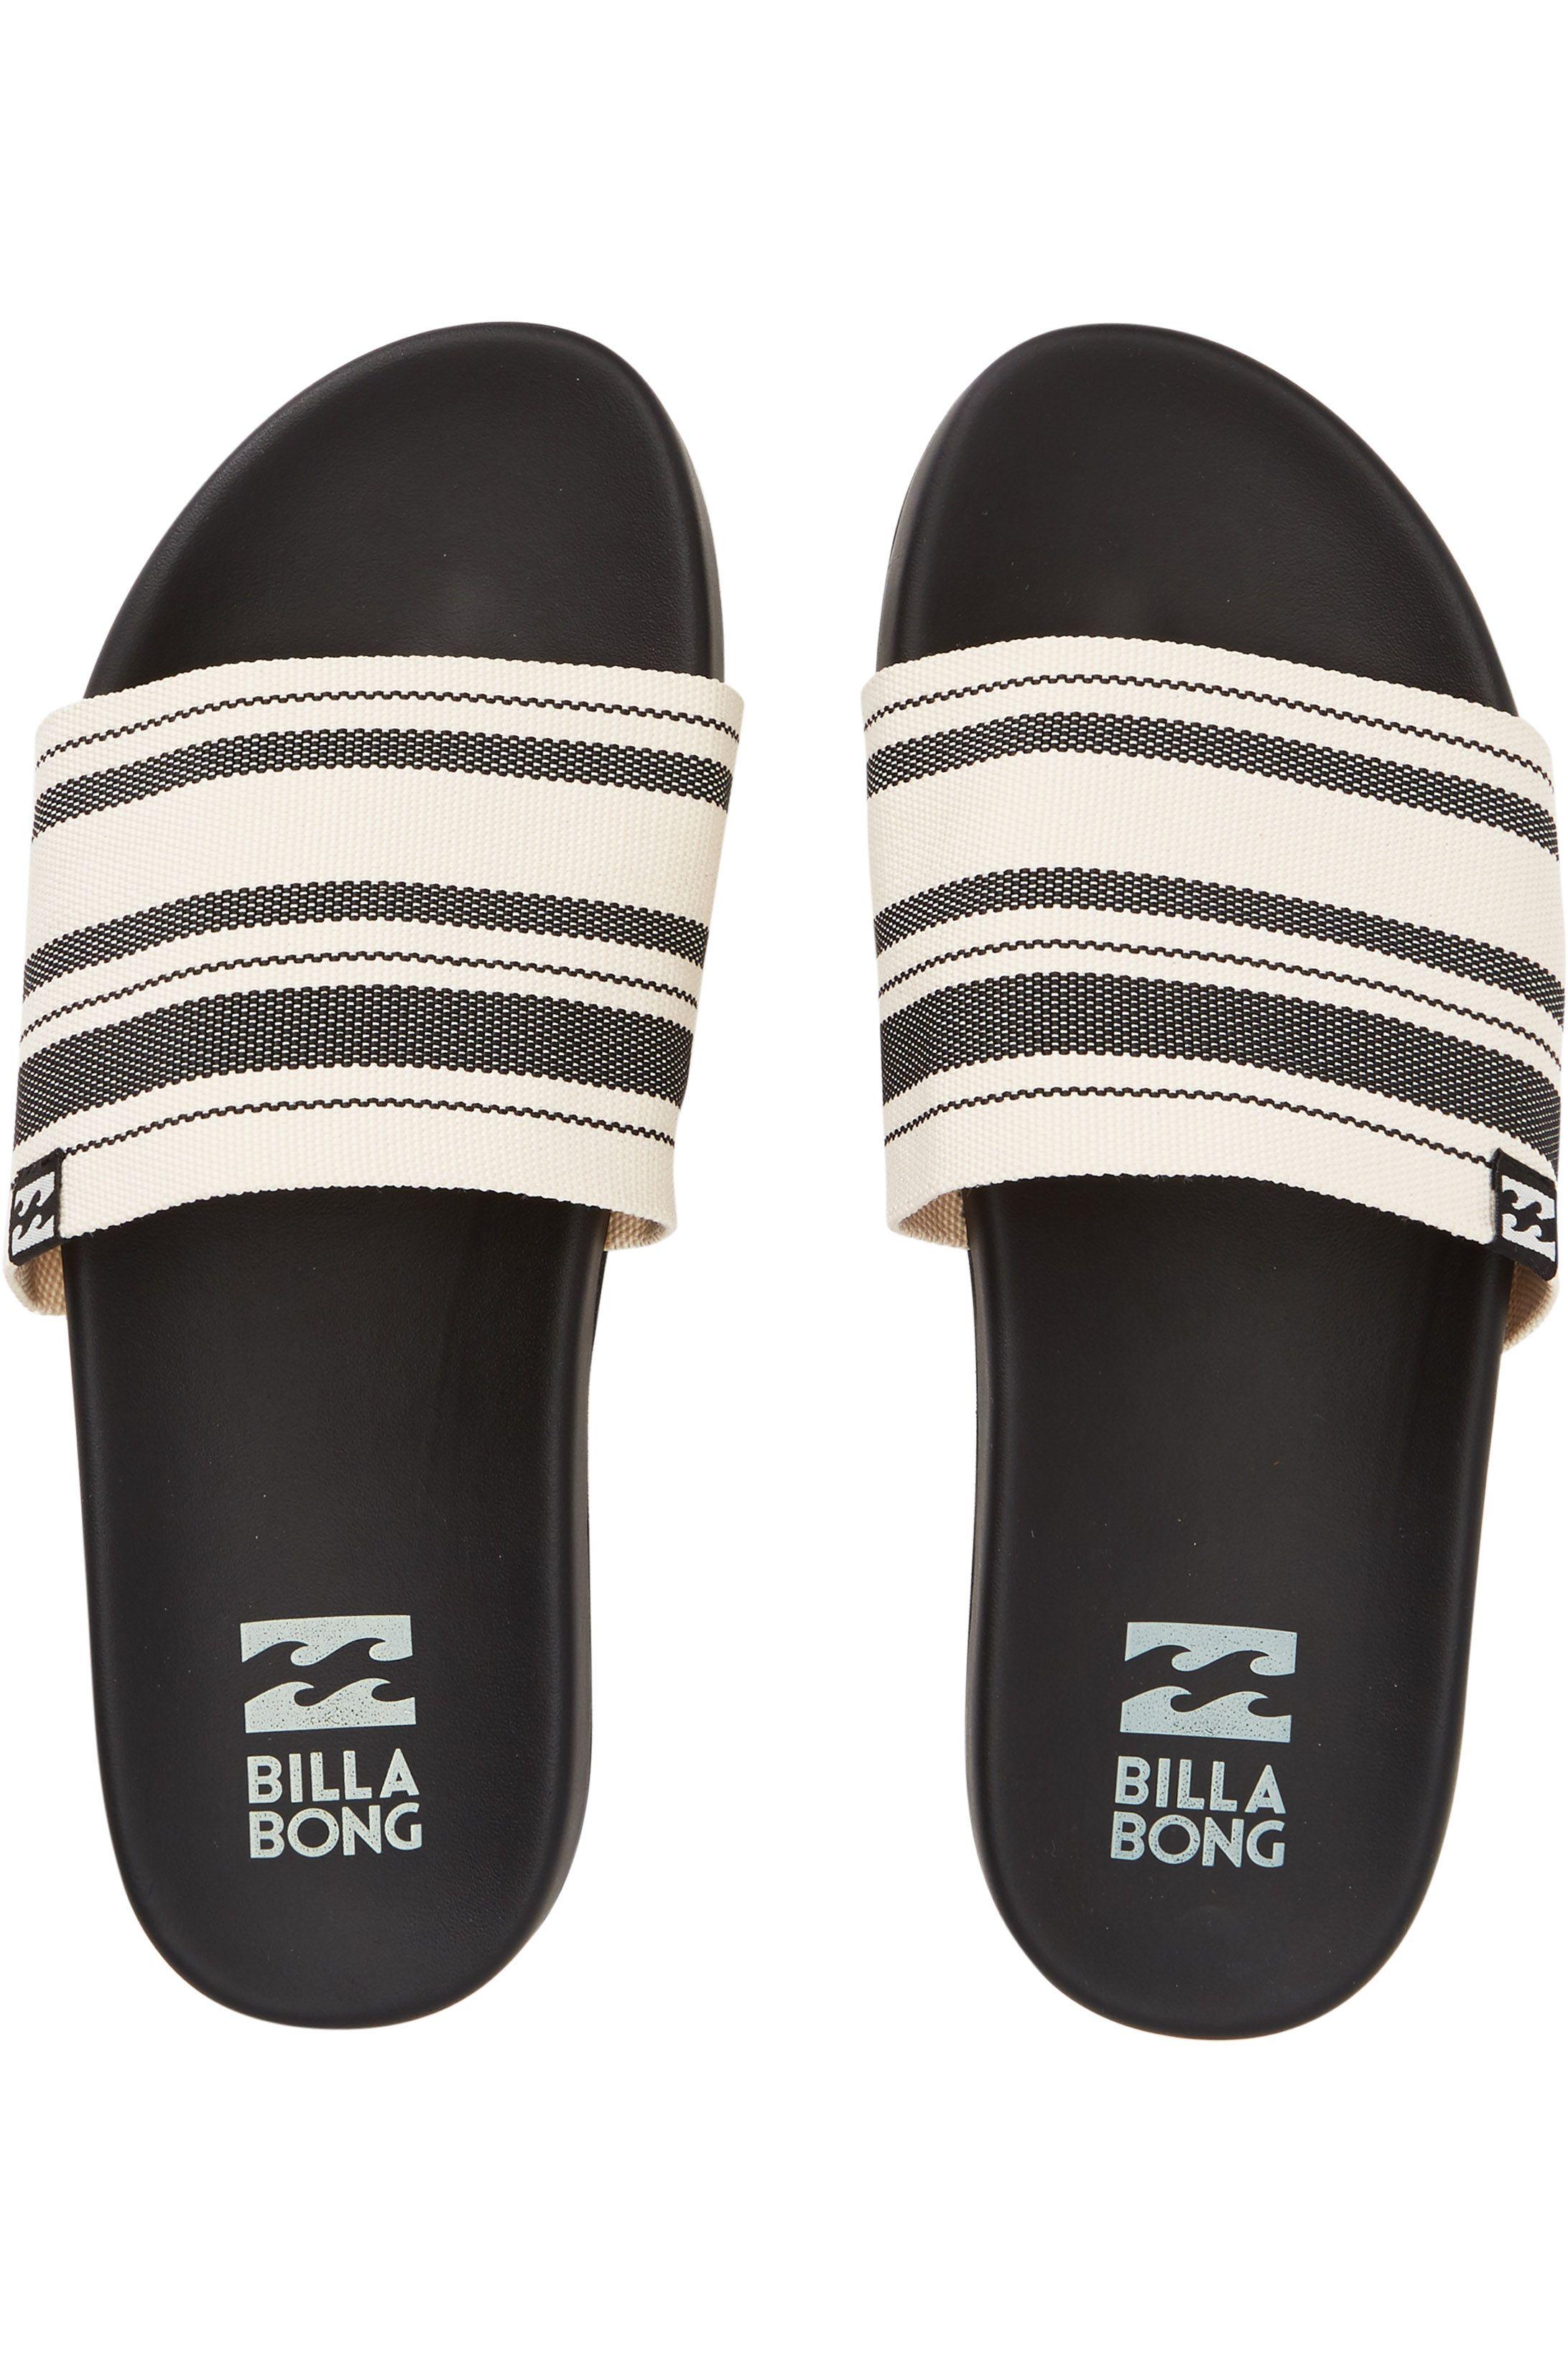 Chinelos Billabong SURF RETREAT PARADISE COVE Black White